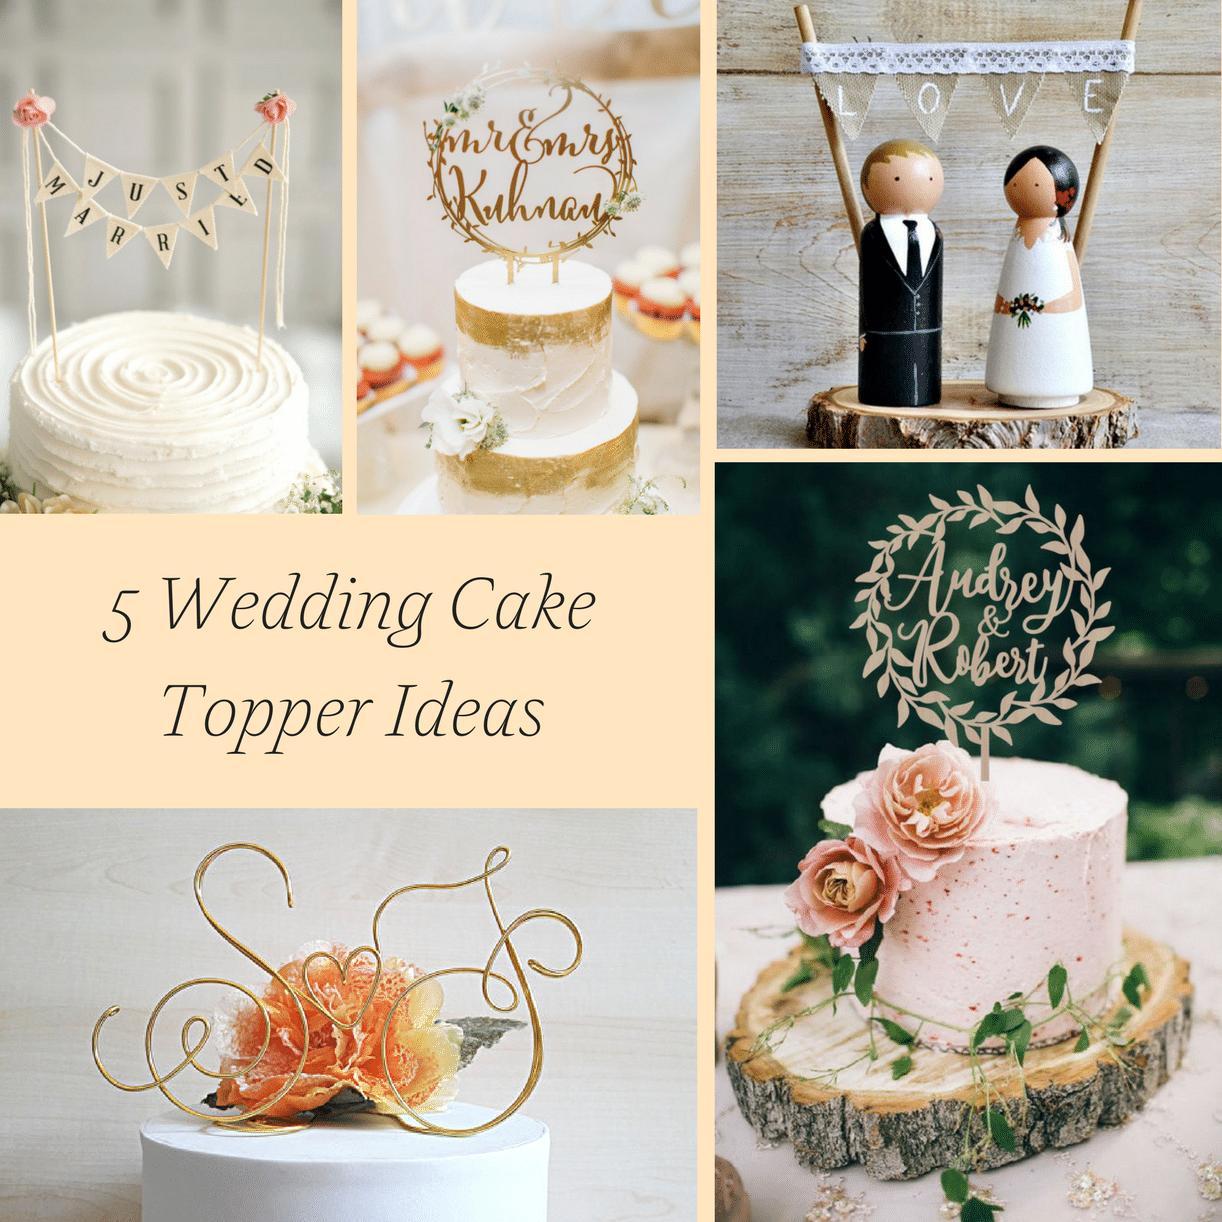 5 Wedding Cake Topper Ideas Hill City Bride